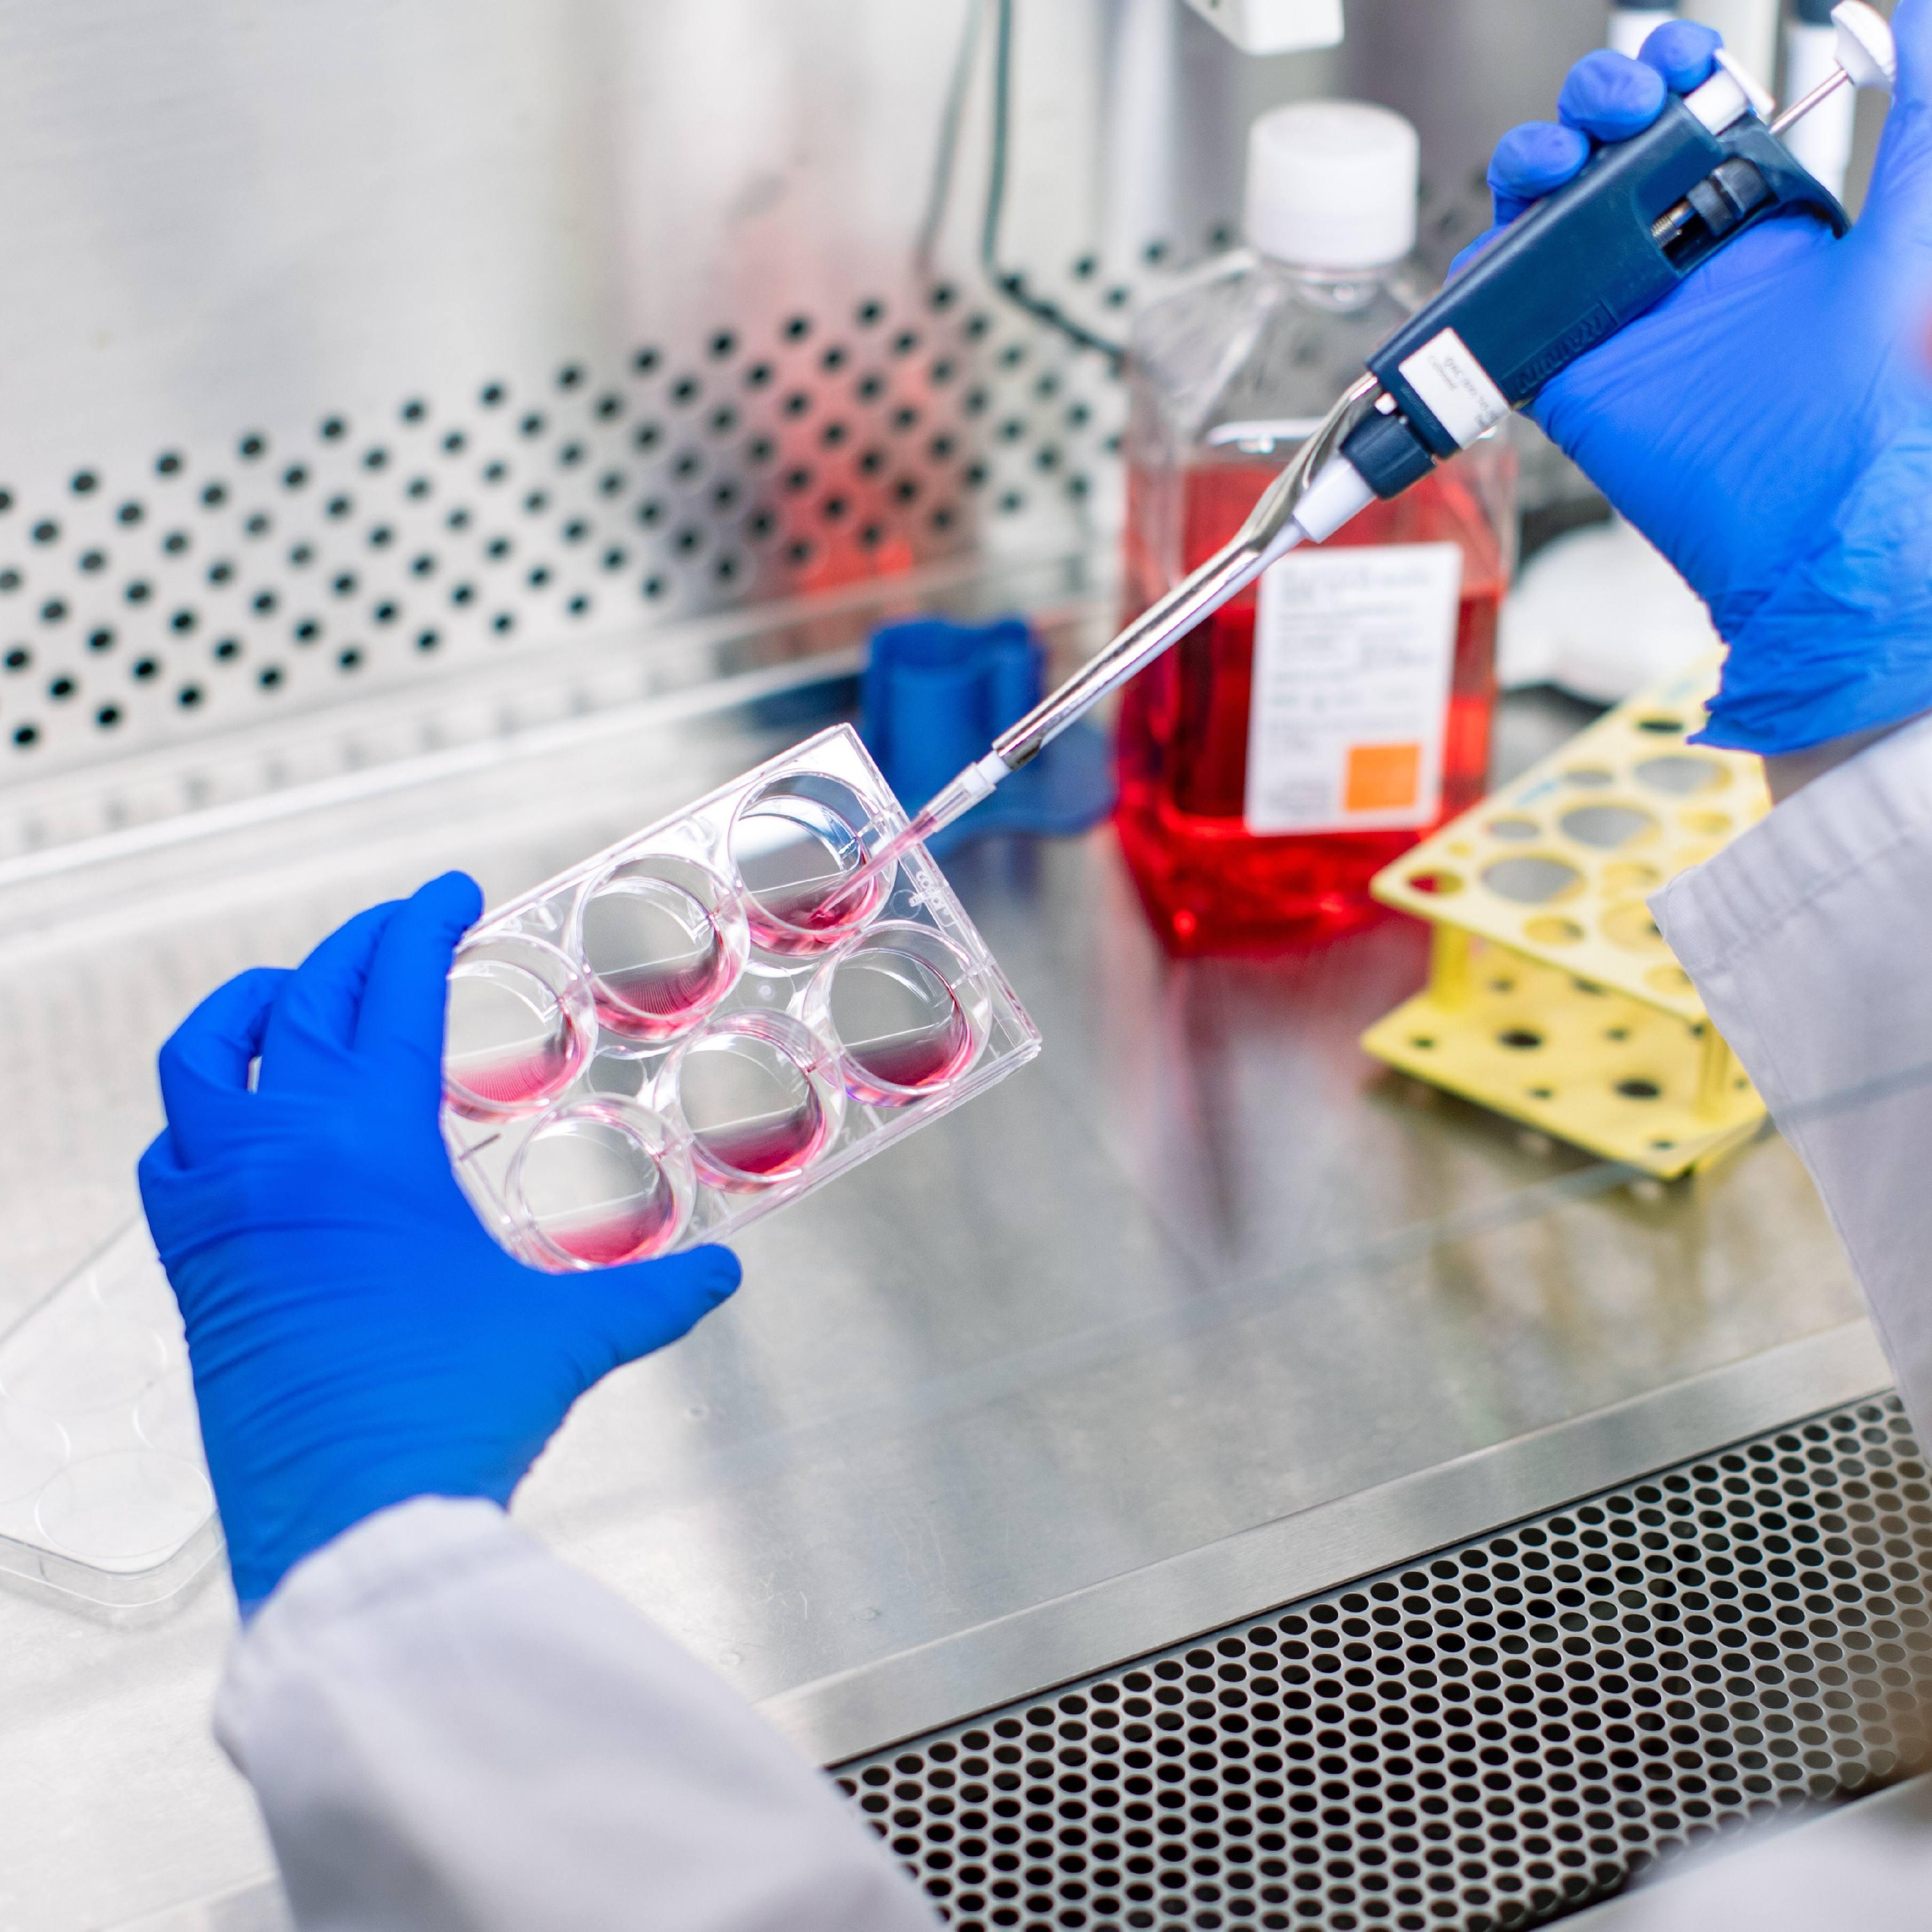 close up medical researcher's hands wearing blue gloves working with specimens in laboratory - Van Cleve Cardiac Regenerative Medicine Program